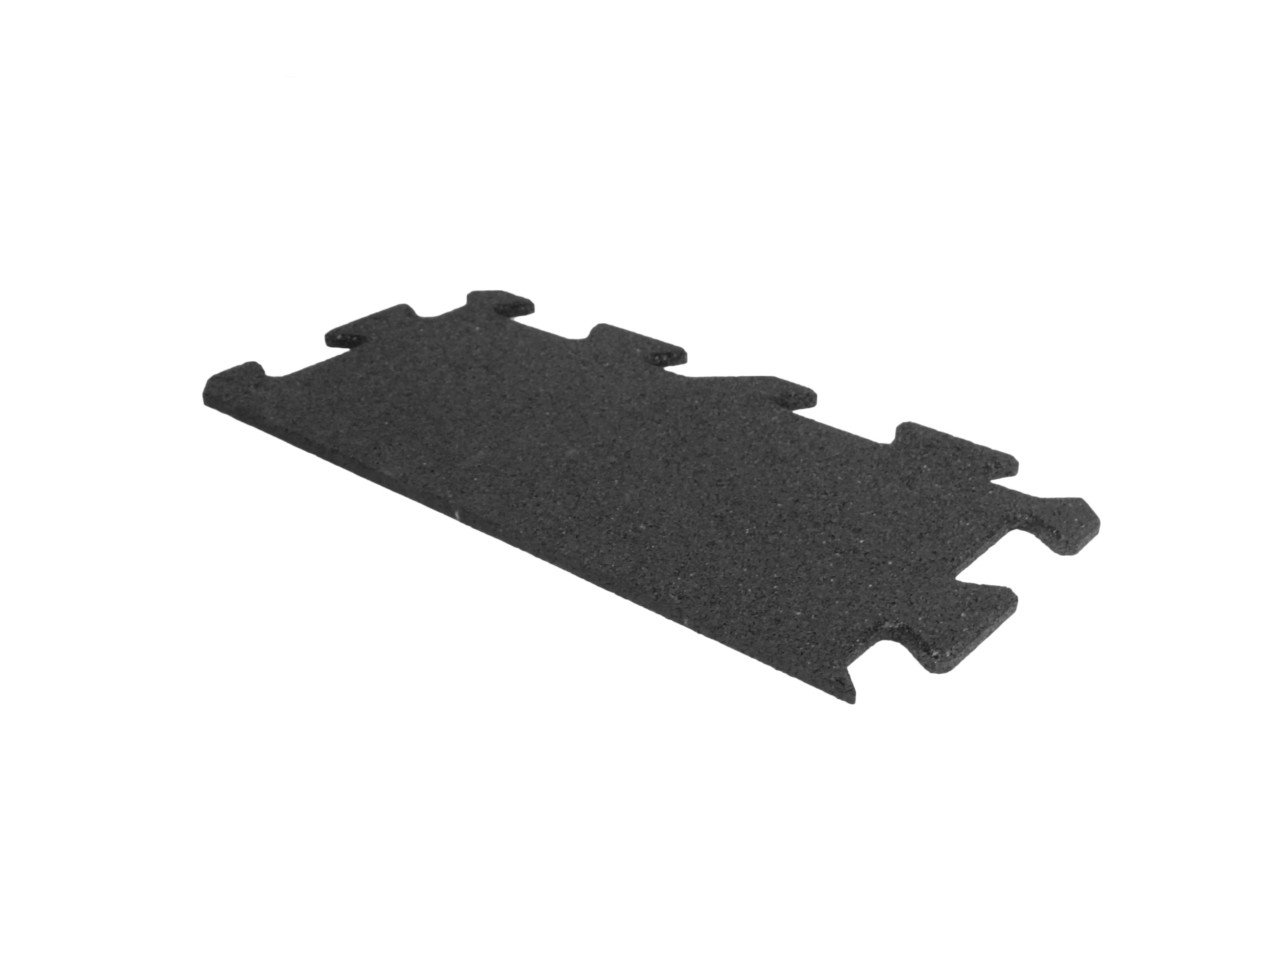 Lifemaxx ECO Puzzle Gummiflise Endekant 50 x 25 x 1 cm